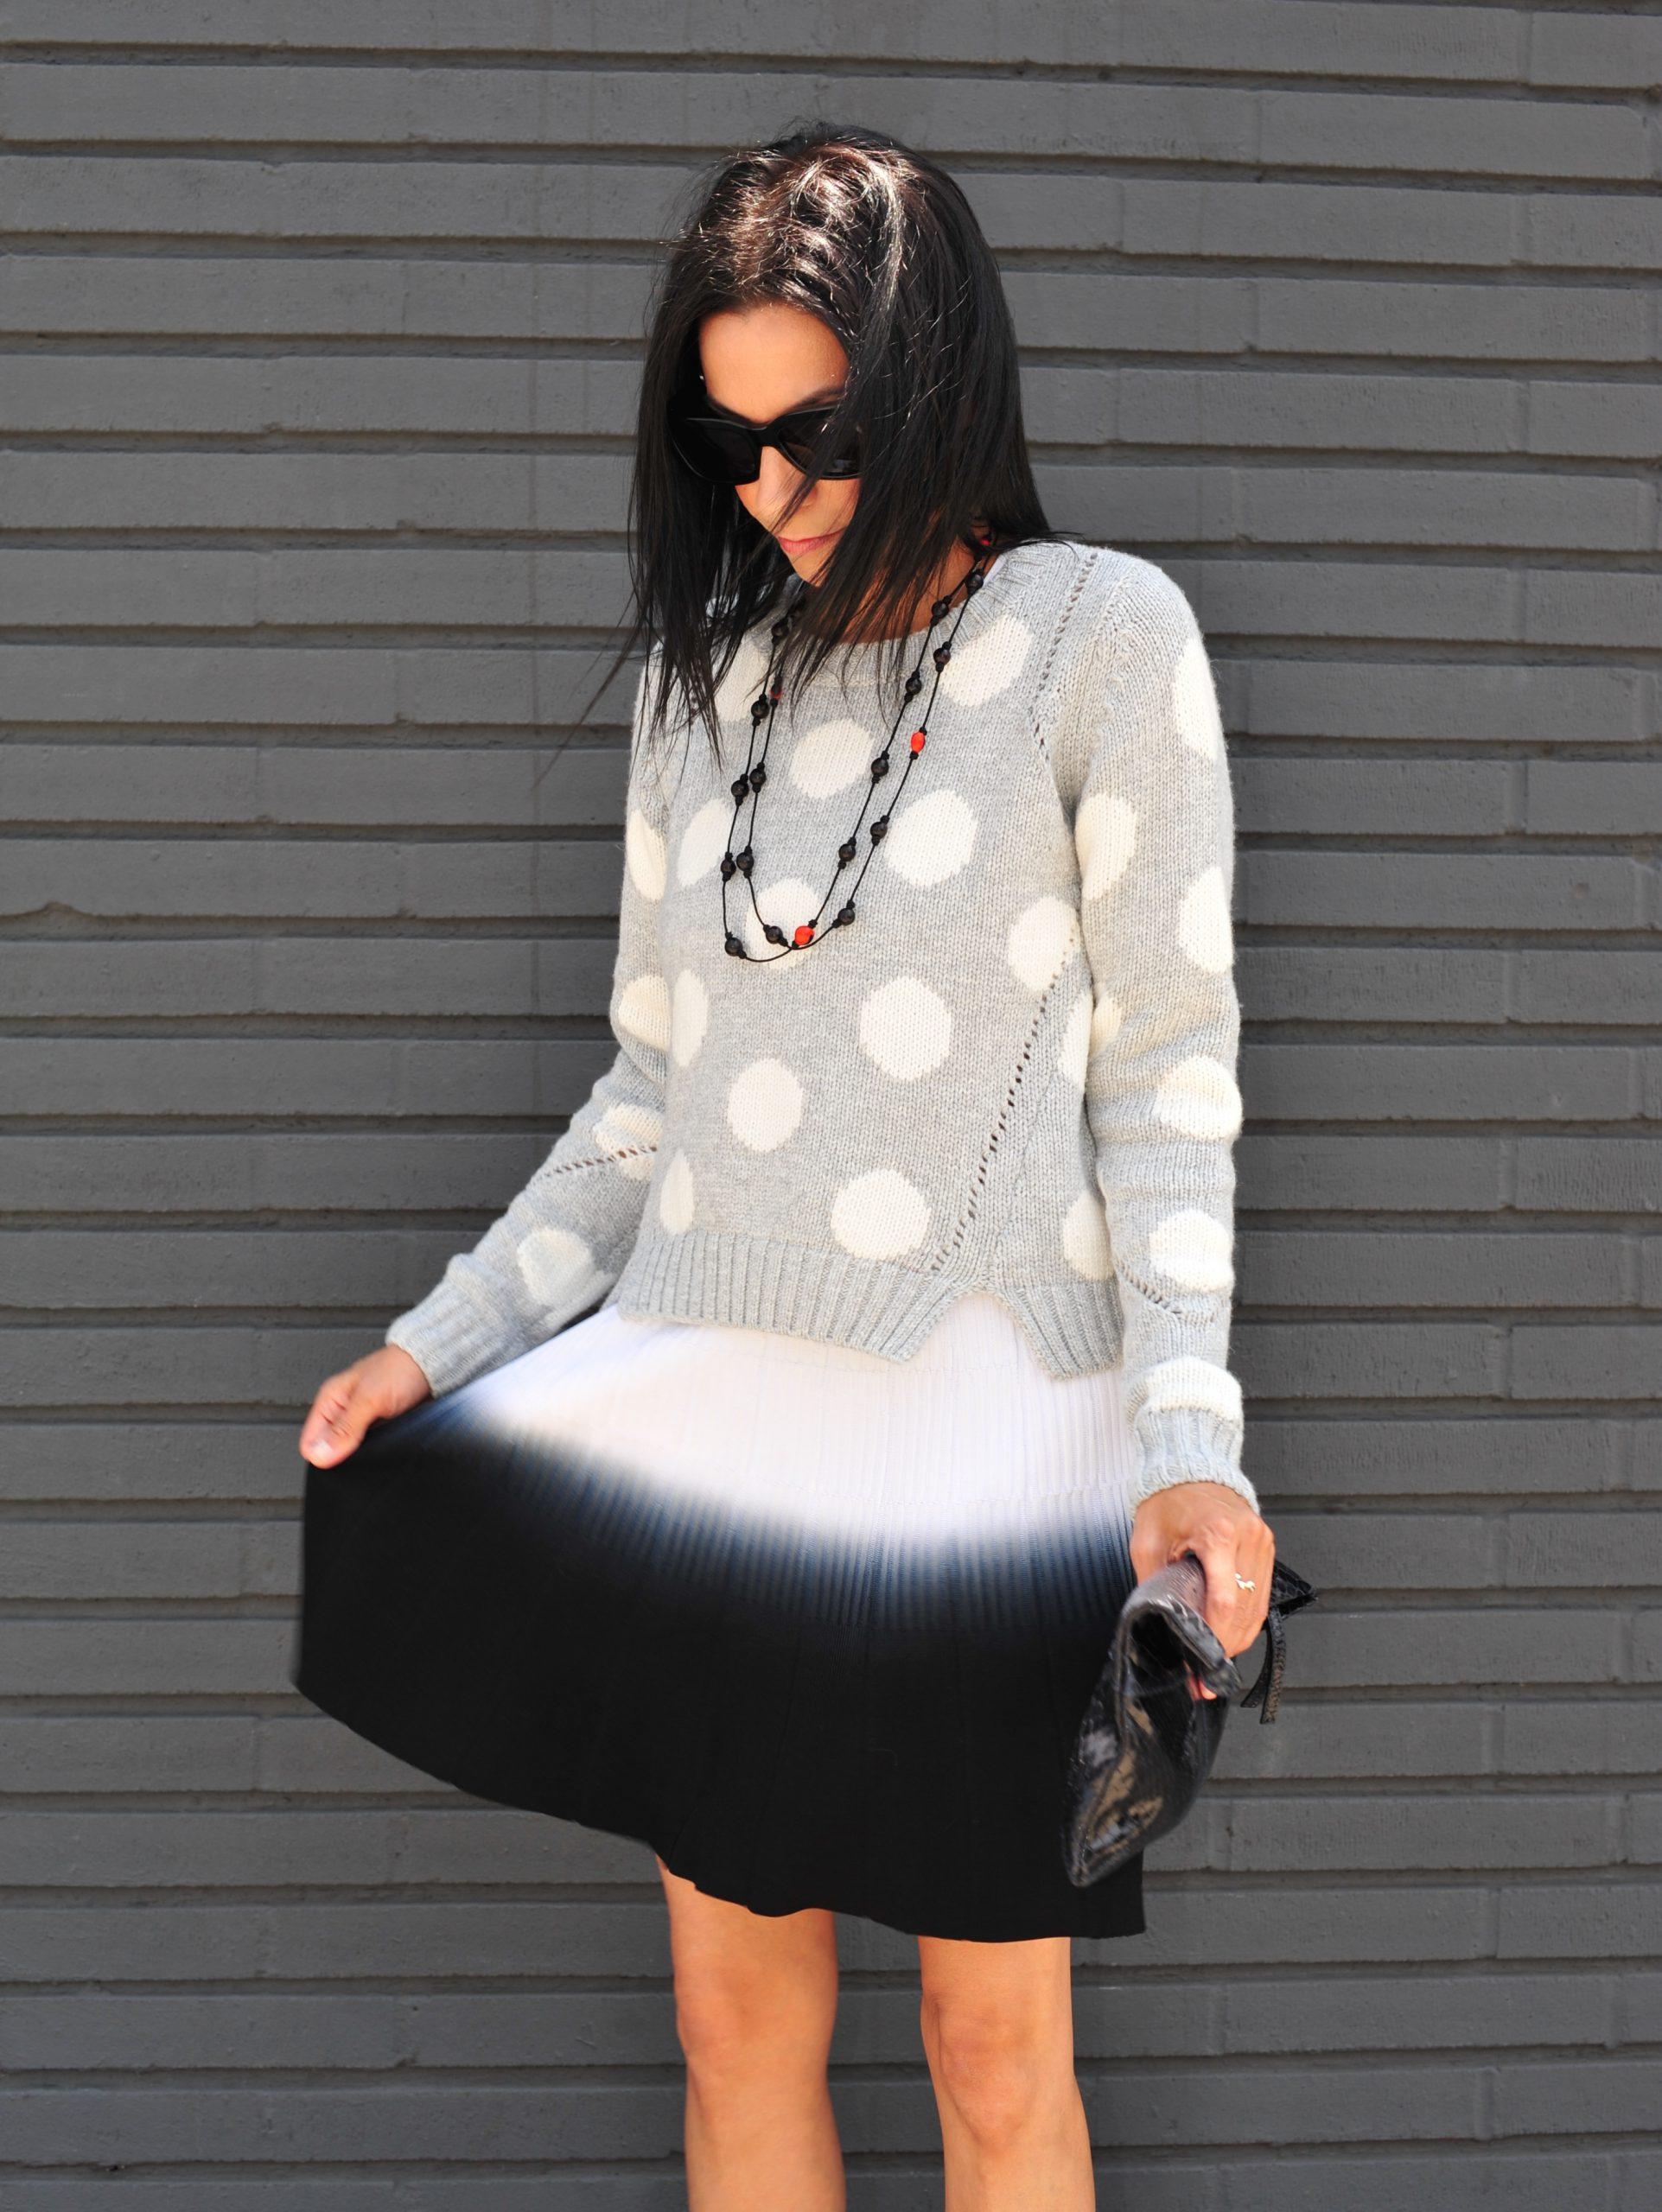 Cool Tone - Parker Skirt & Polka Dot Sweater